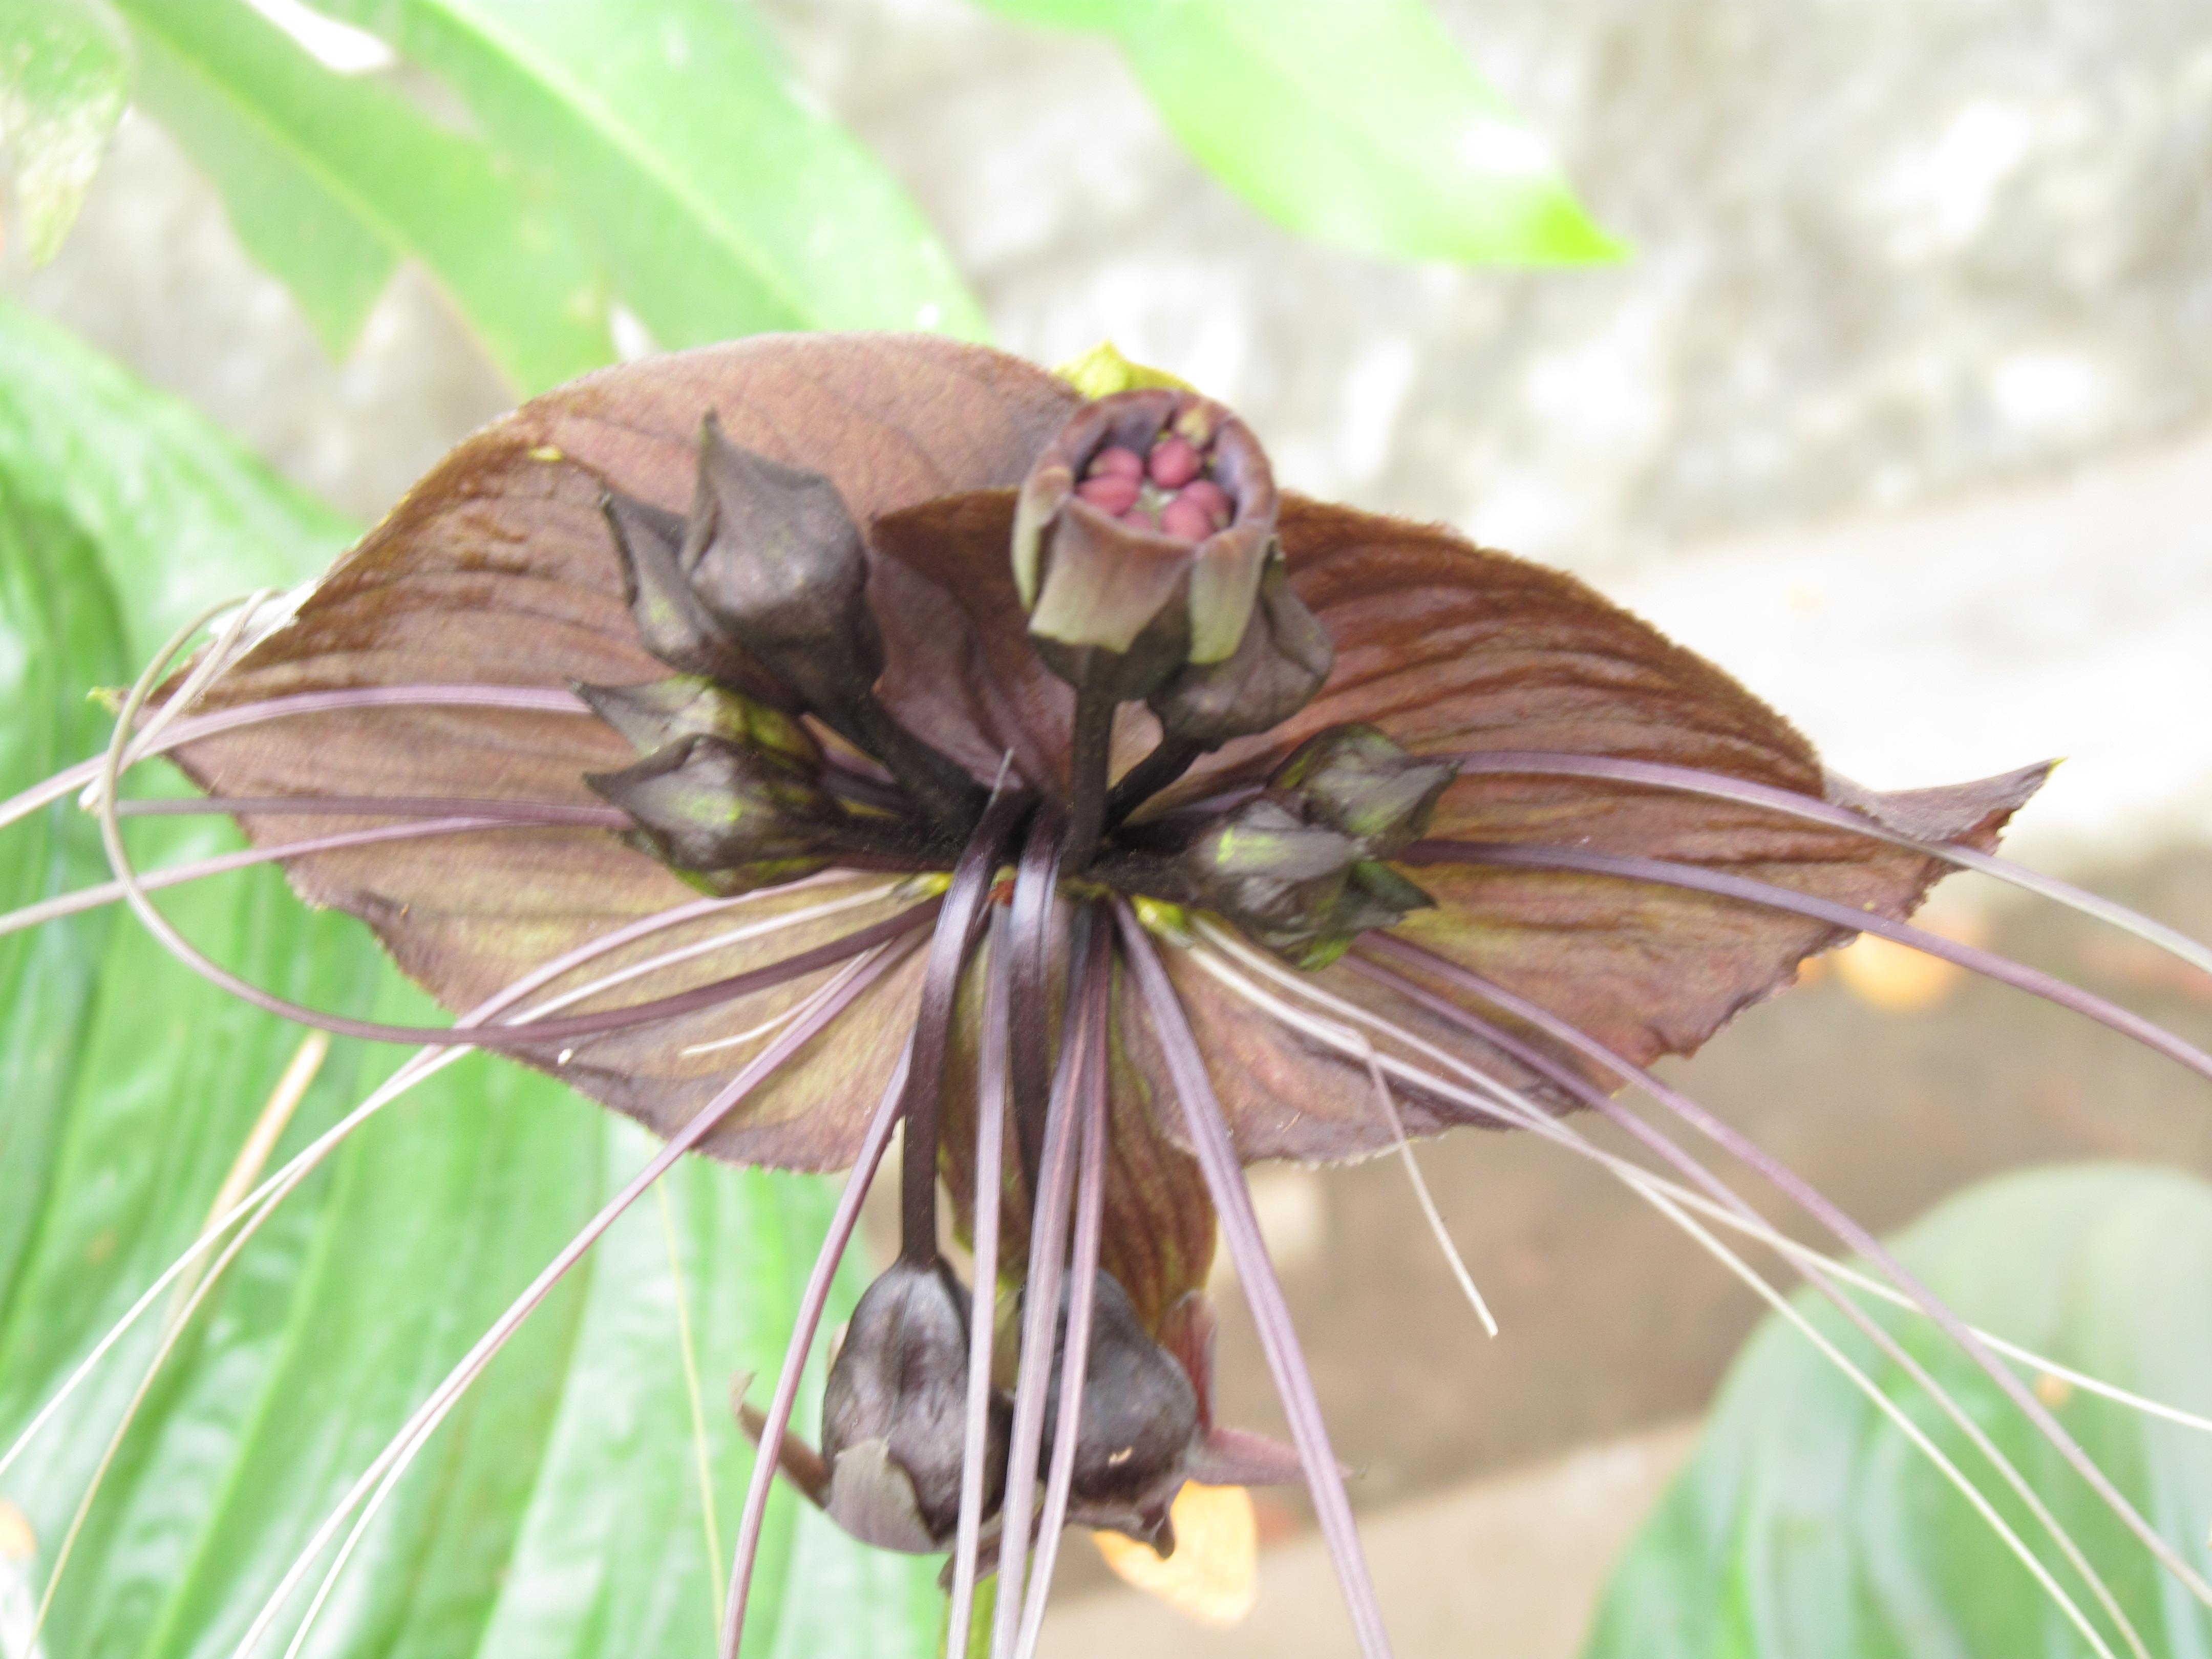 File Tacca chantrieri Kerala Vavvalpoovu black bat flower 02 JPG Wikime